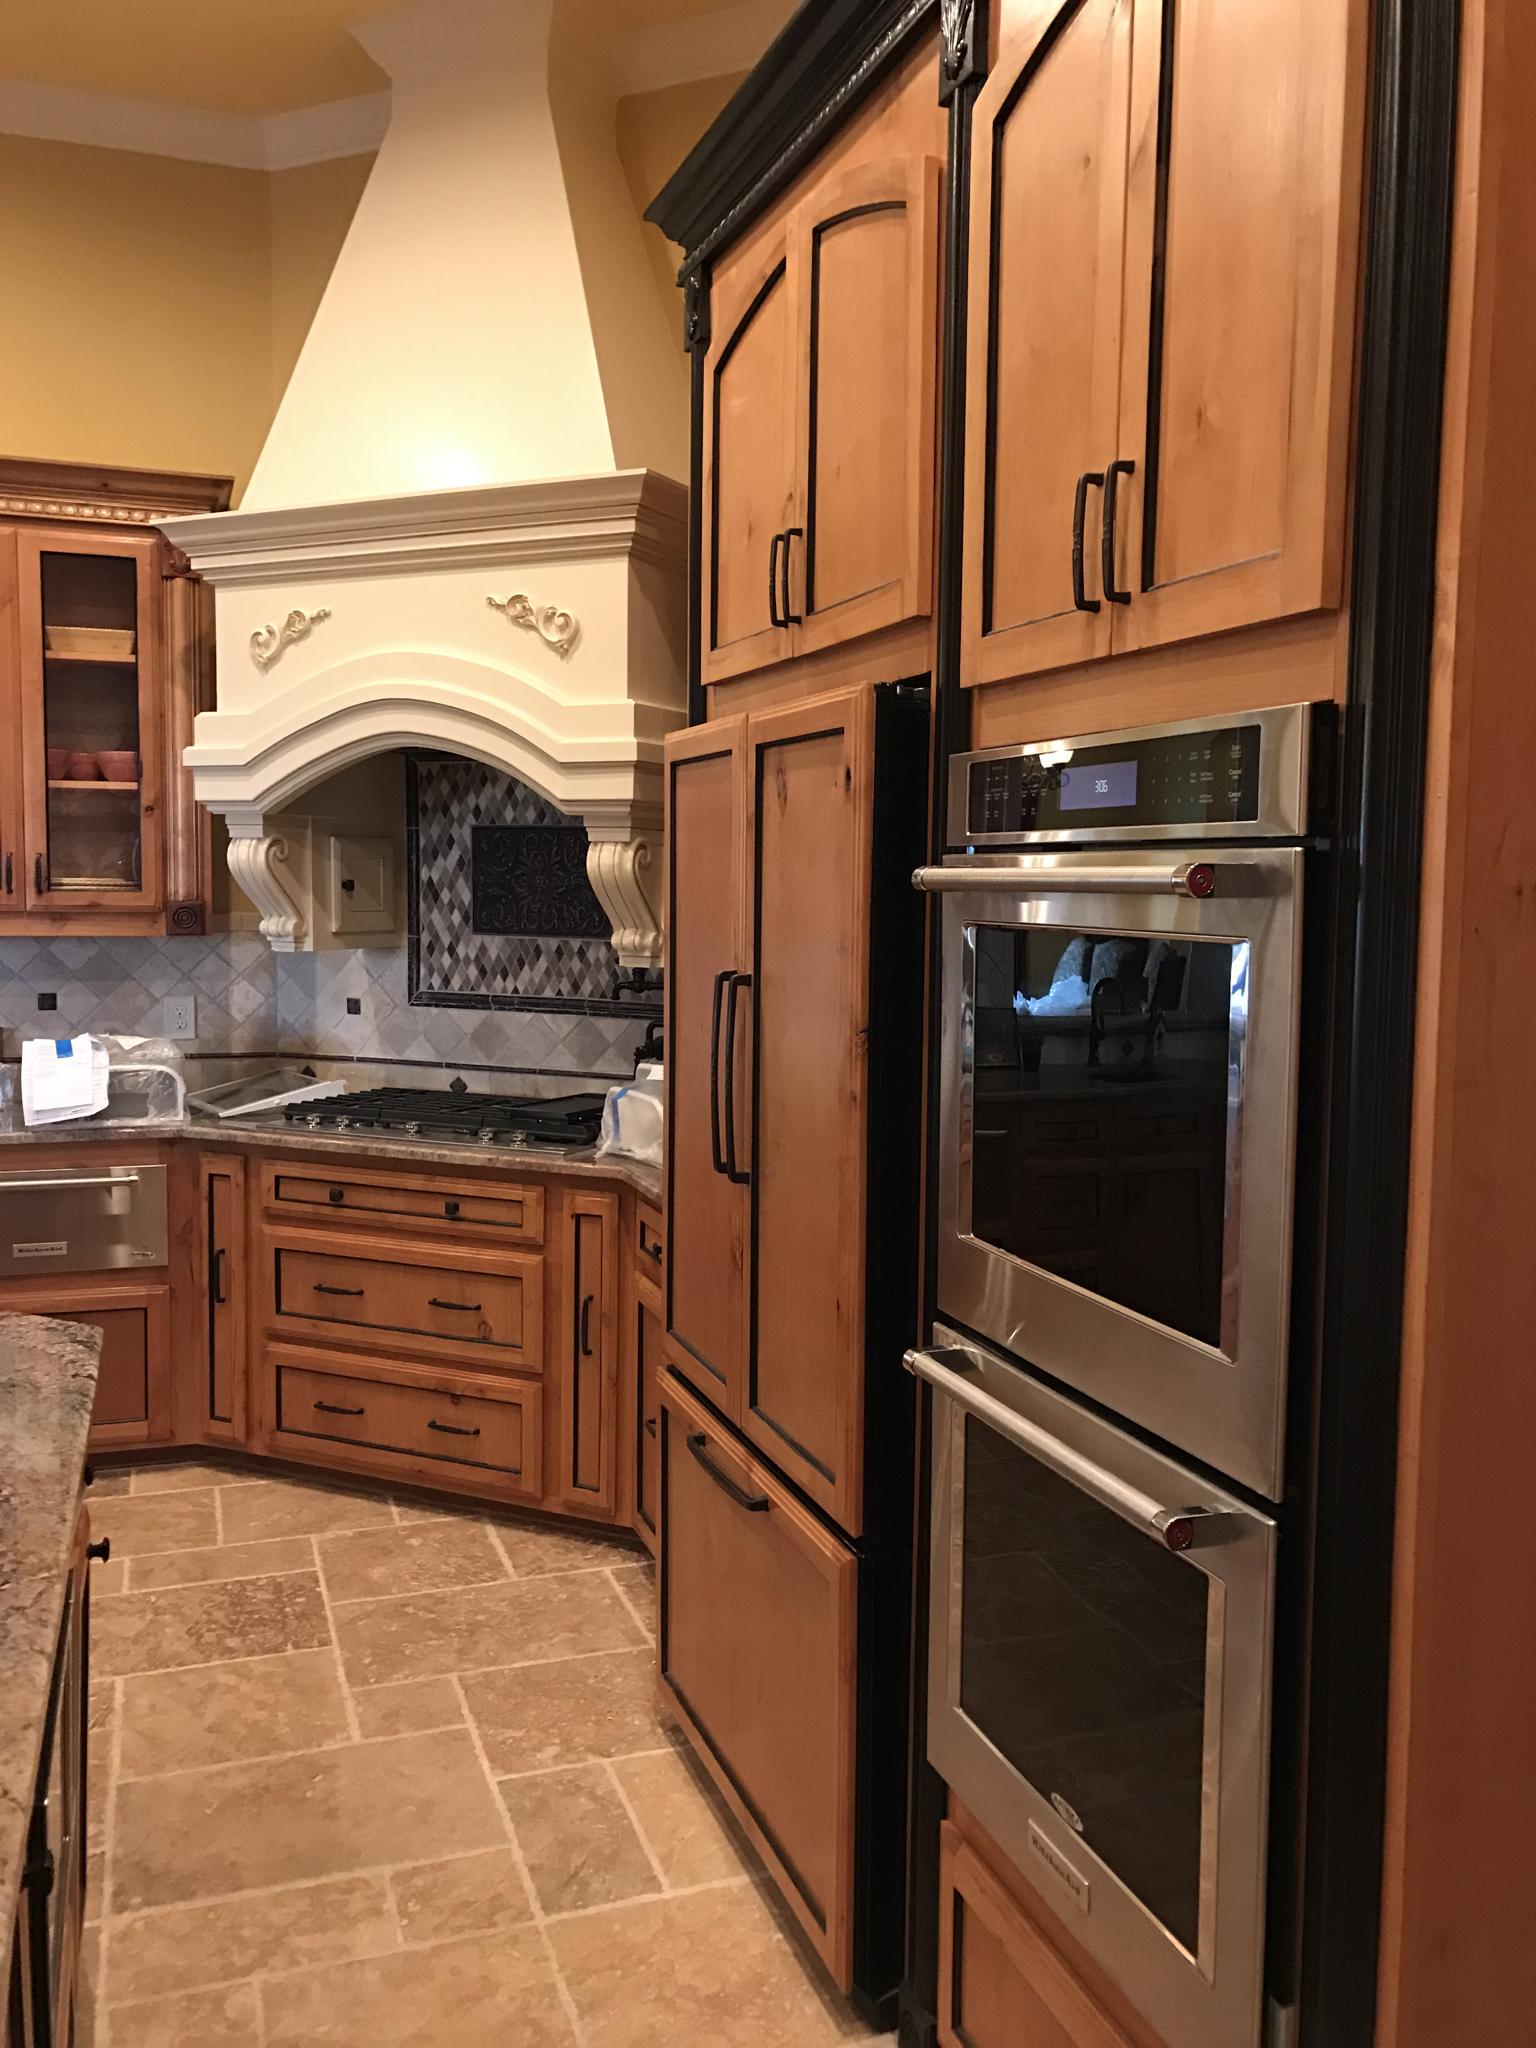 Custom Home Designs Inc Sinton TX 78387 YPcom